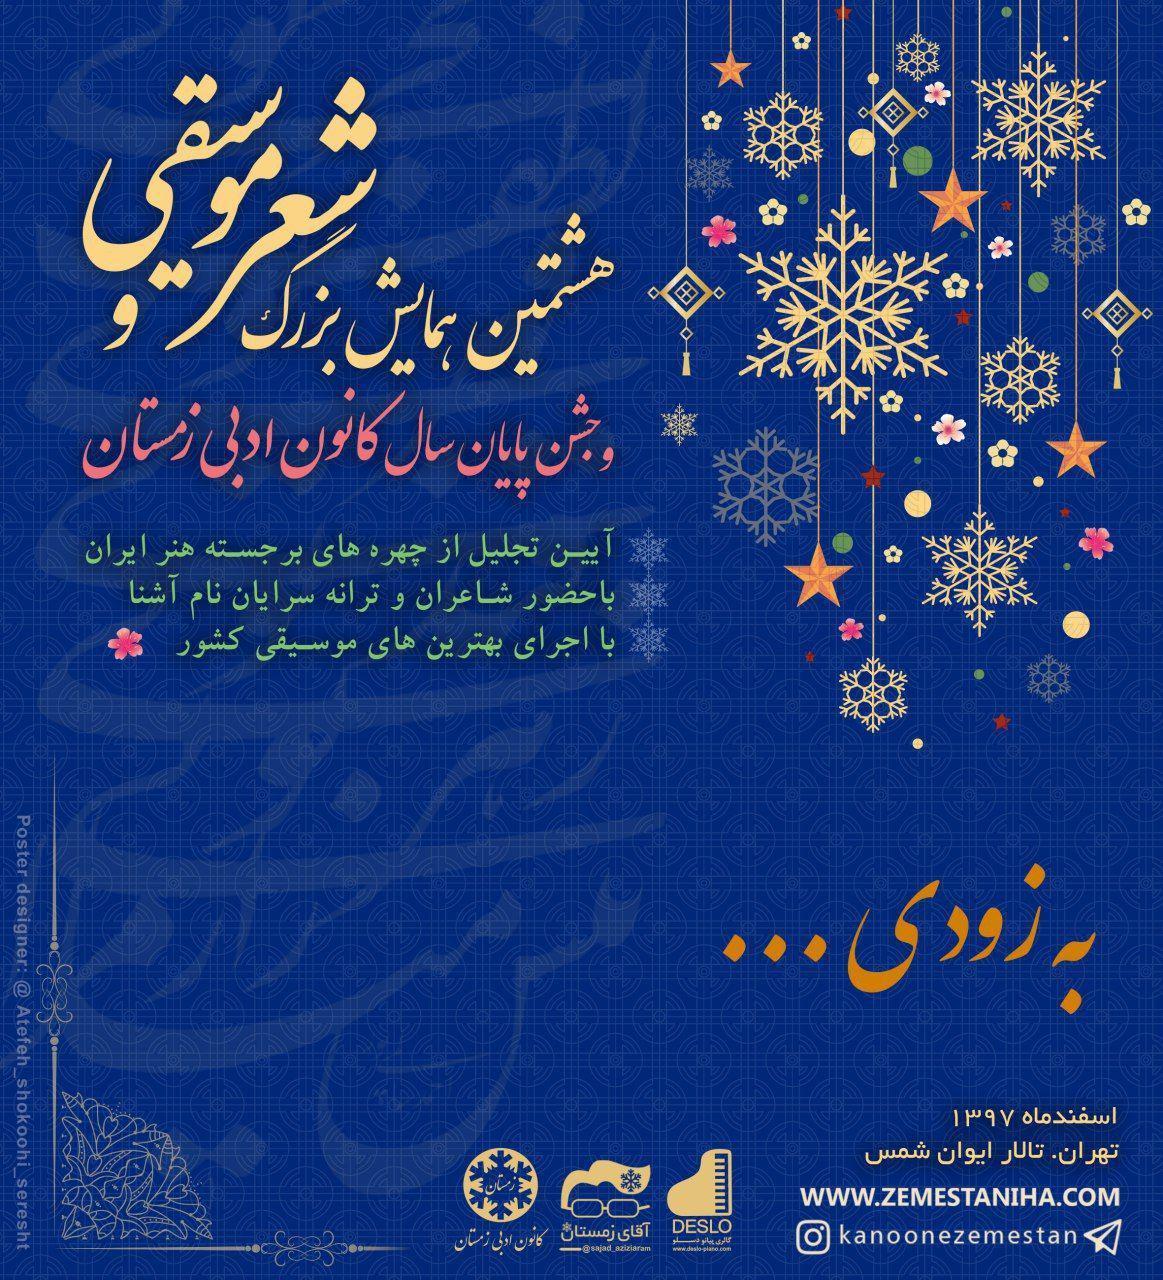 جشن پایان سال کانون ادبی زمستان